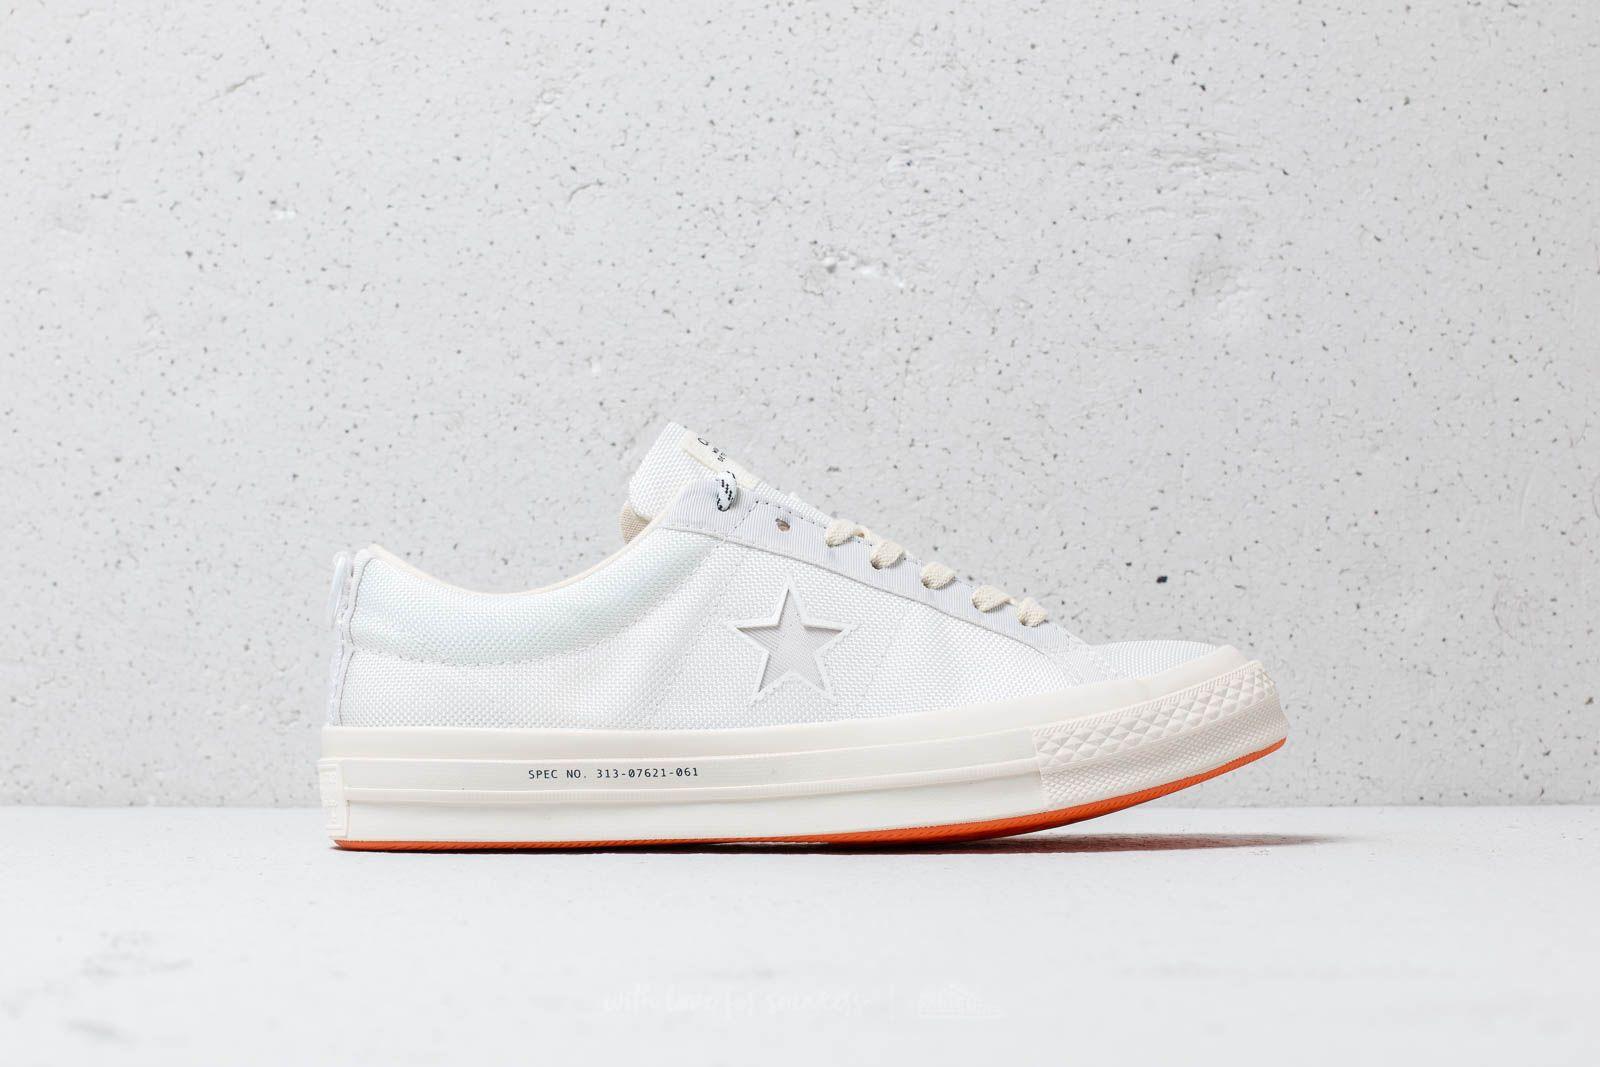 4a84a60042cf Converse x Carhartt WIP One Star OX White  White  Vibrant Orange at a great